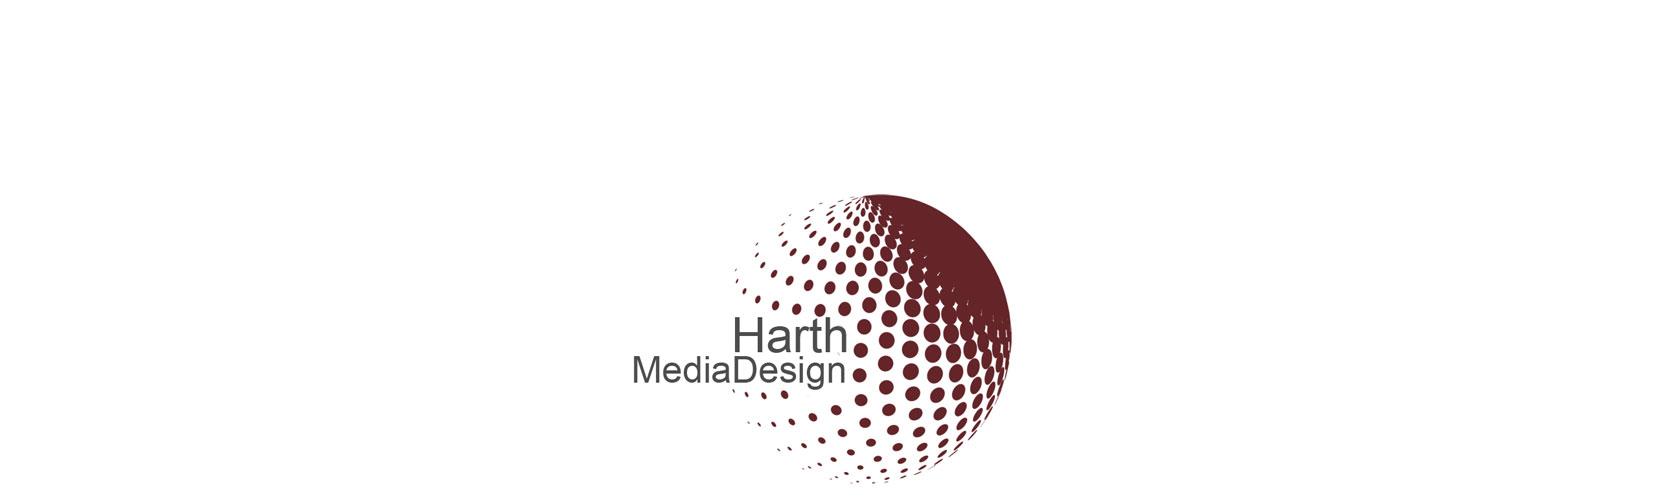 Logo Harth MediaDesign